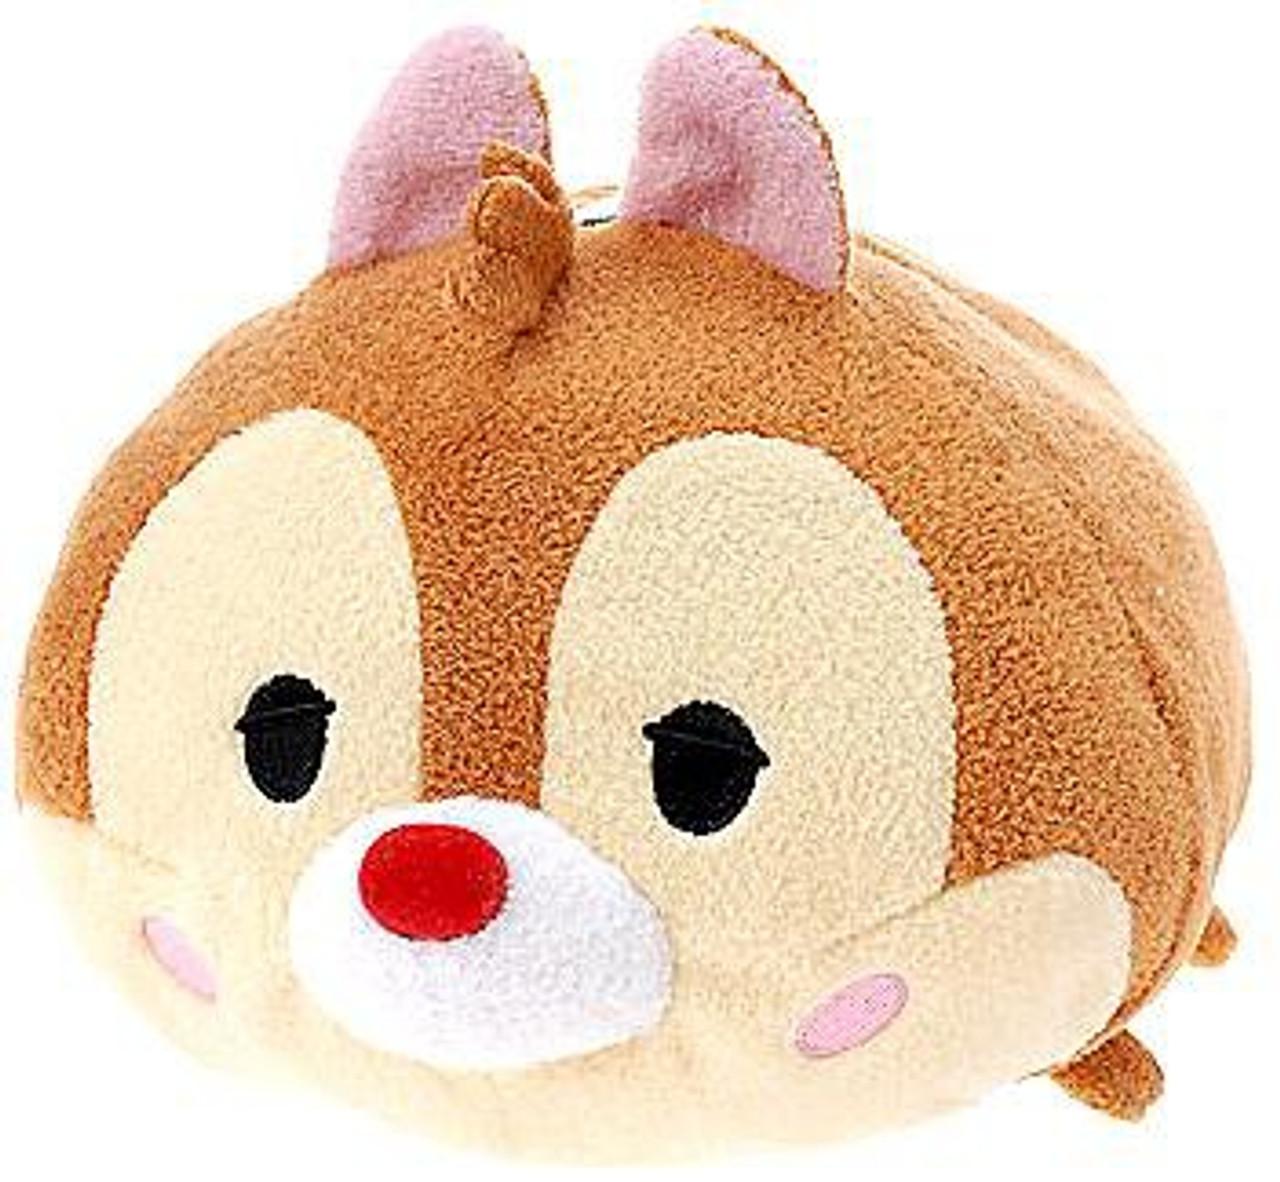 Disney Tsum Tsum Bambi Dale Exclusive 11-Inch Medium Plush